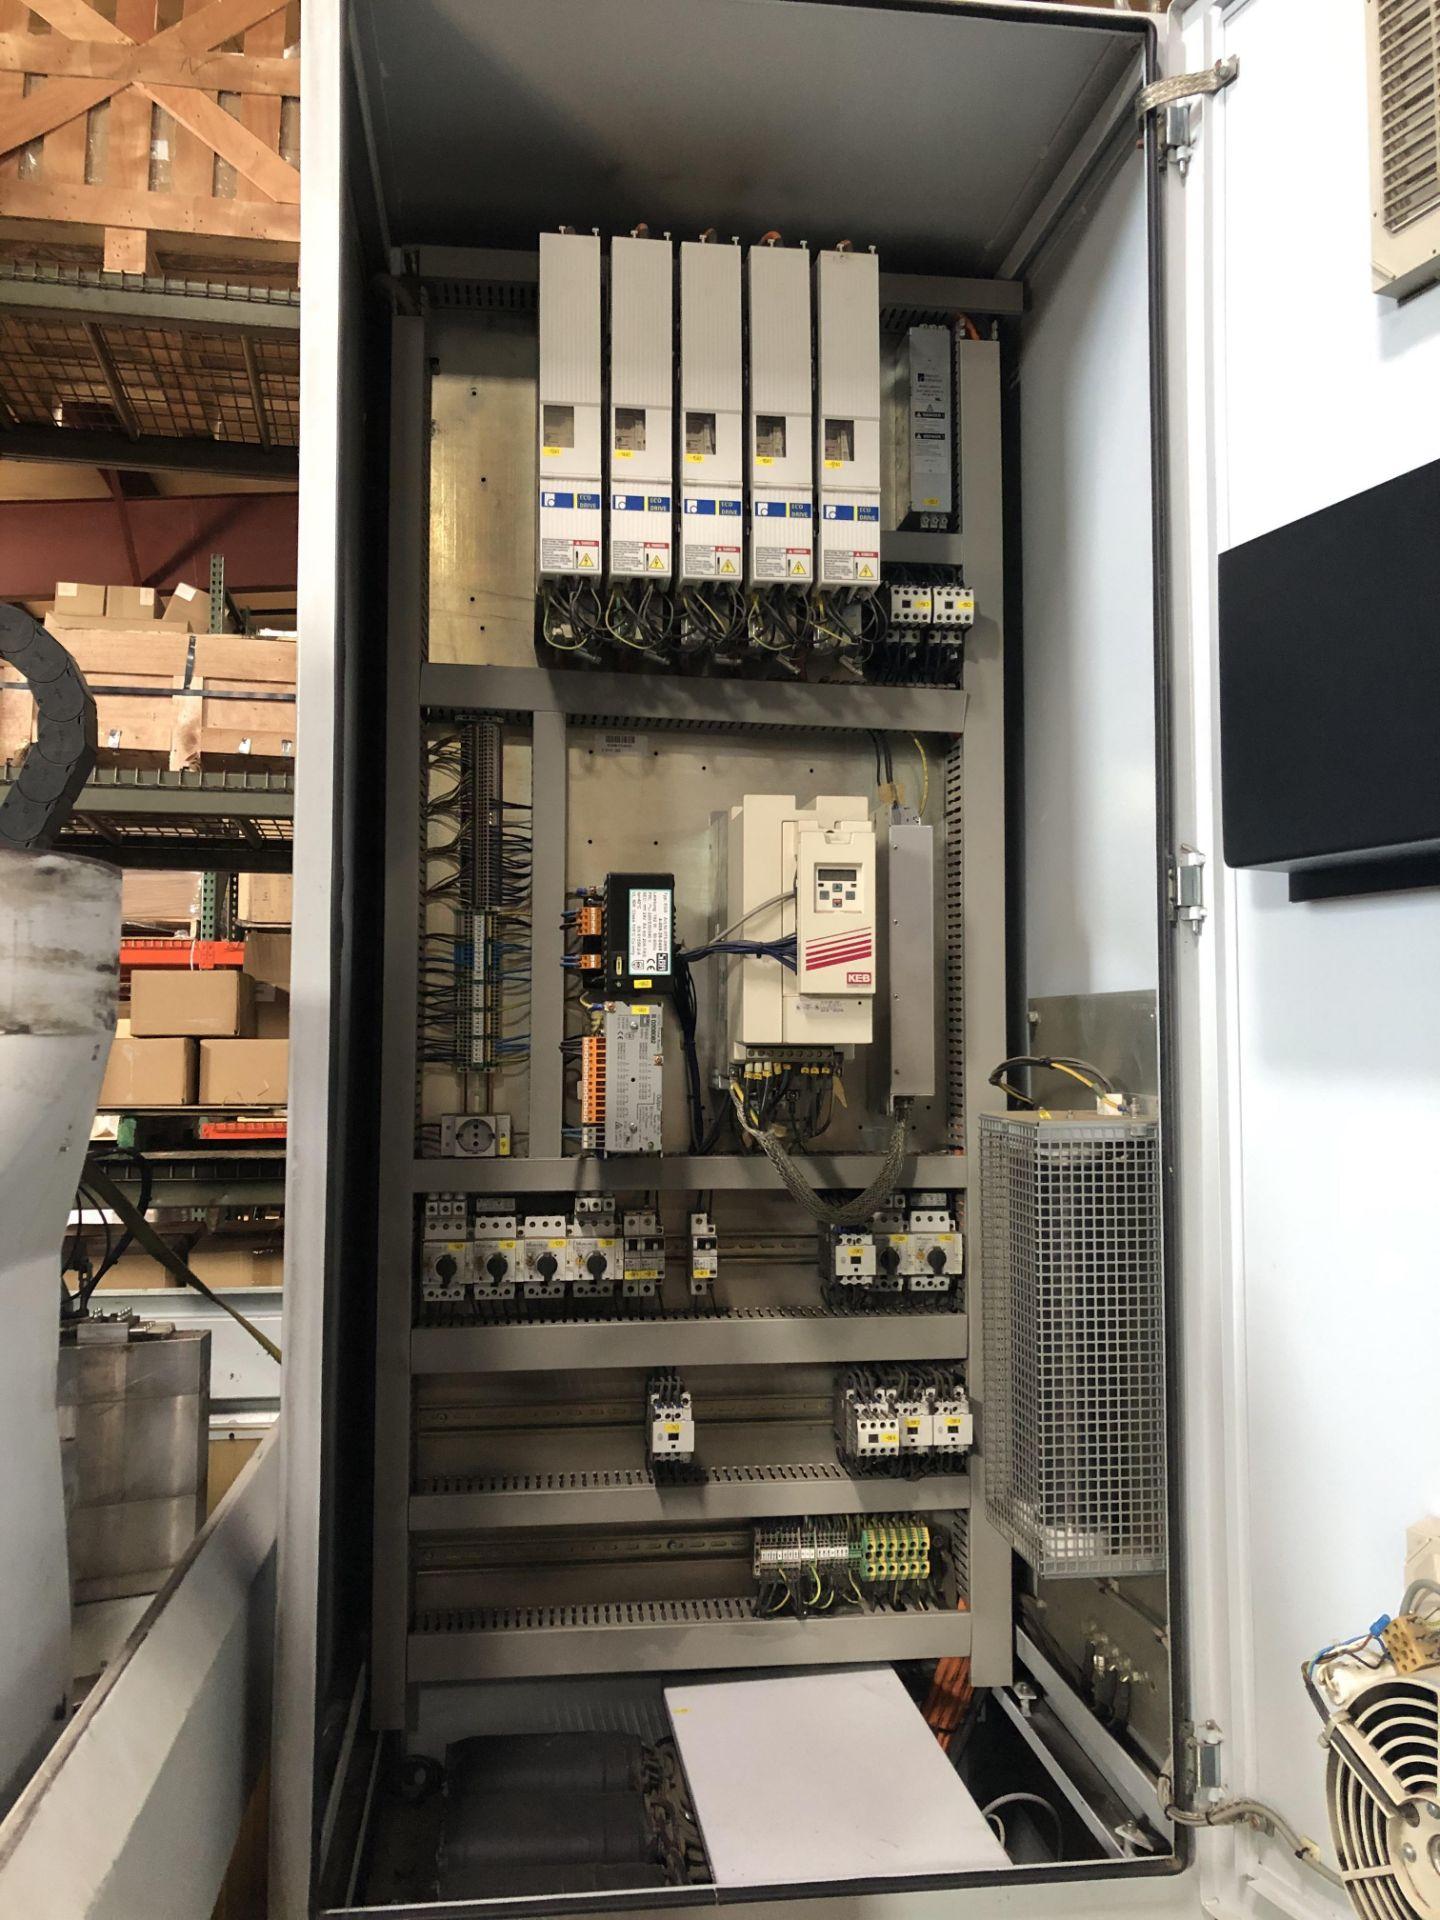 WEEKE BHC-350 Wood CNC MACHINING CENTER - Image 8 of 11